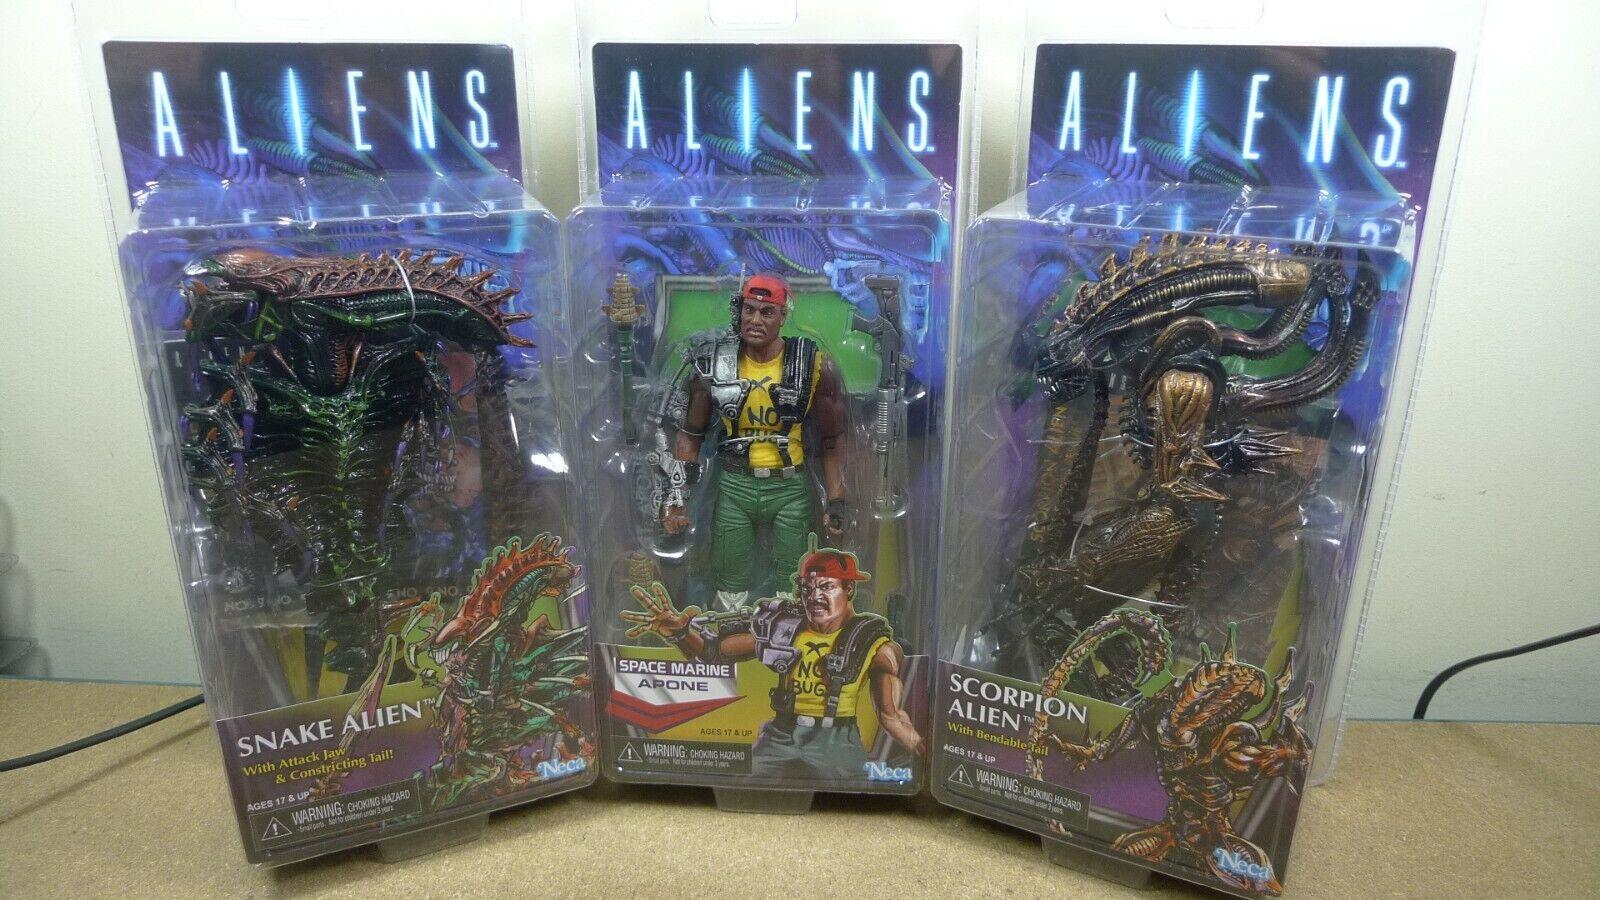 Neca Aliens Serie 13 Kenner Apone, Serpiente & Scorpion Alien Set Completo De 3 figuras